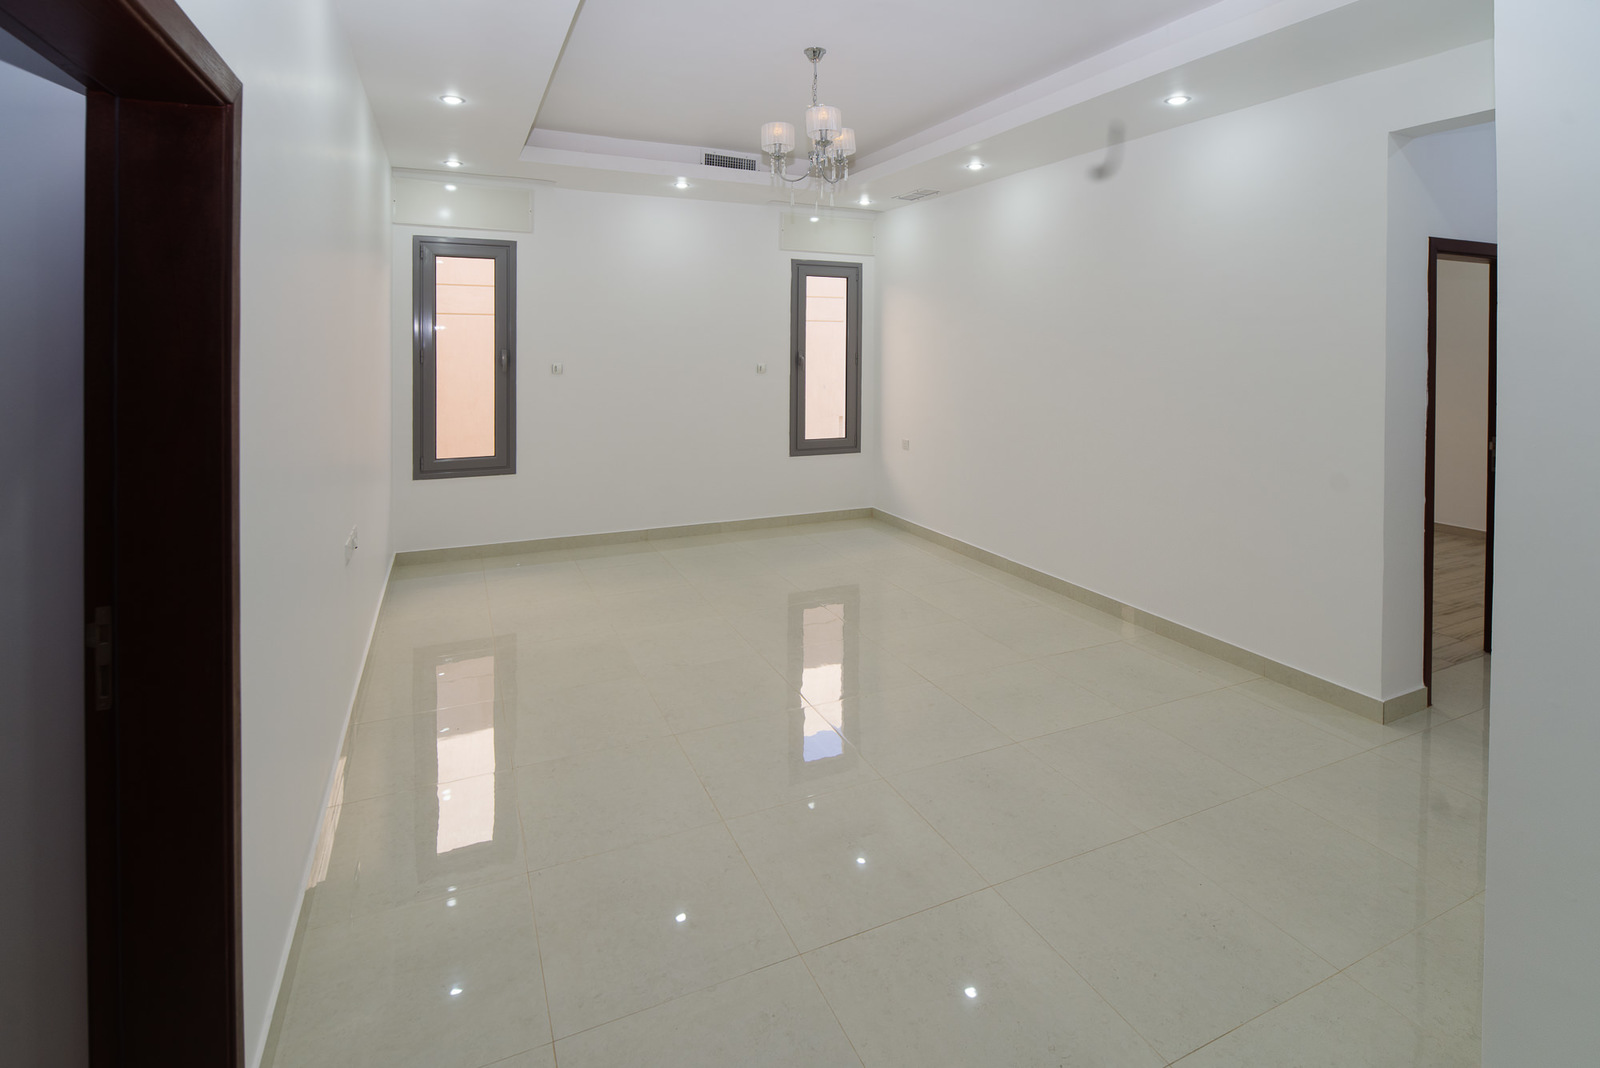 Abu Fatira – new, unfurnished, three bedroom apartments